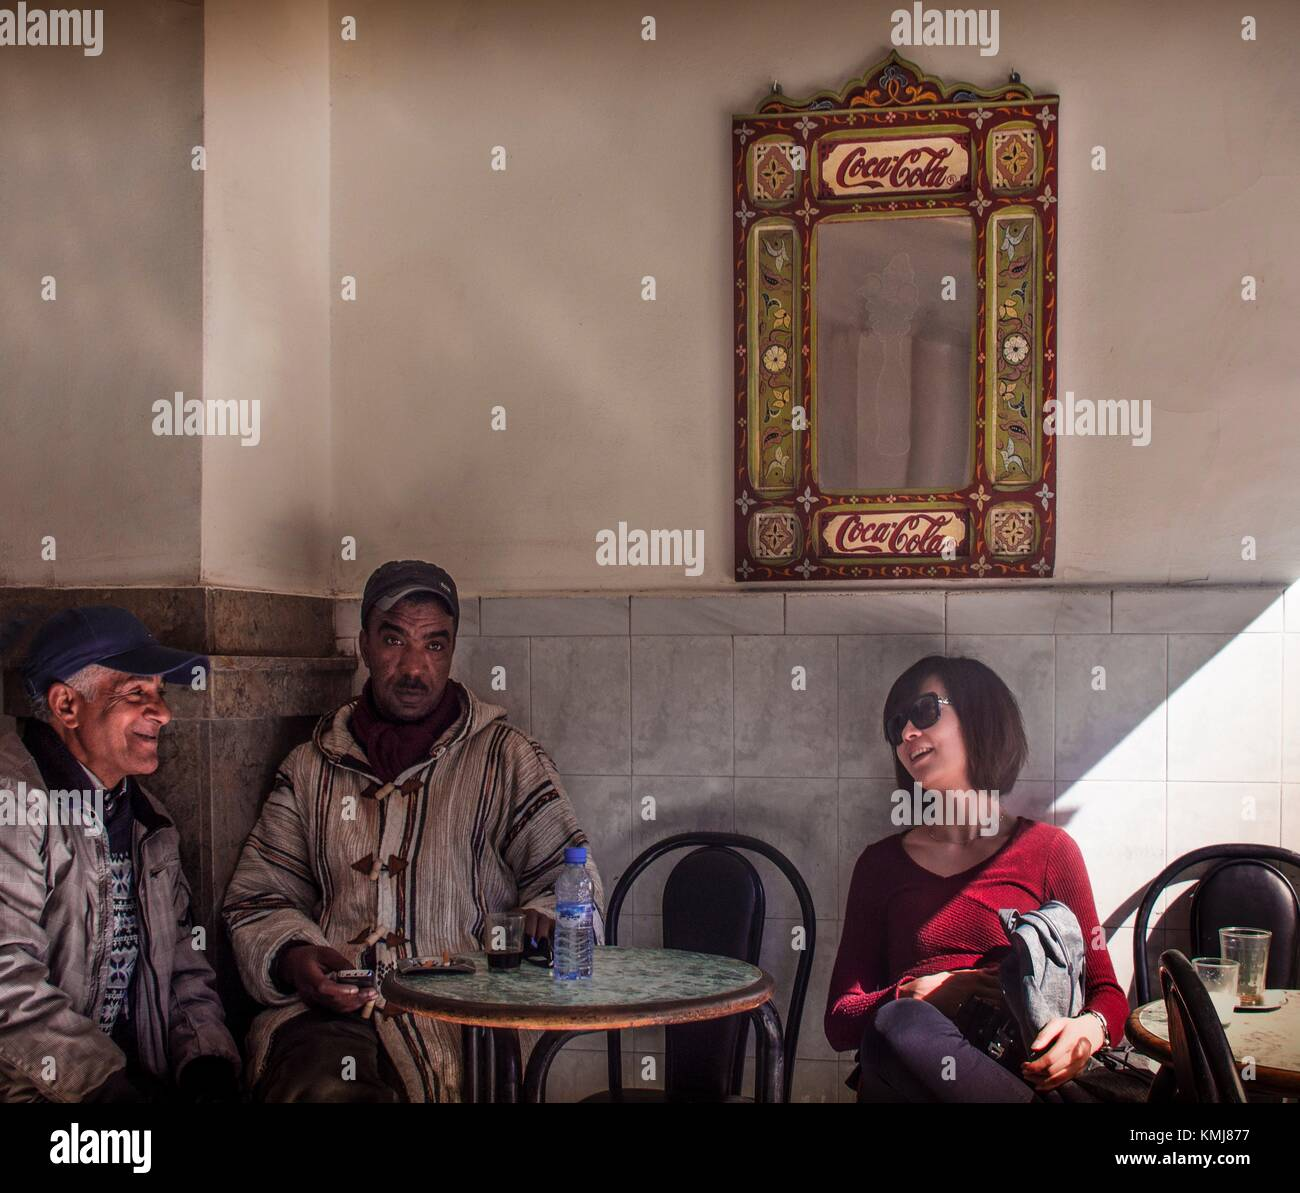 Marokko, Fes, asiatische Touristen mit marokkanern in Fes. Stockbild